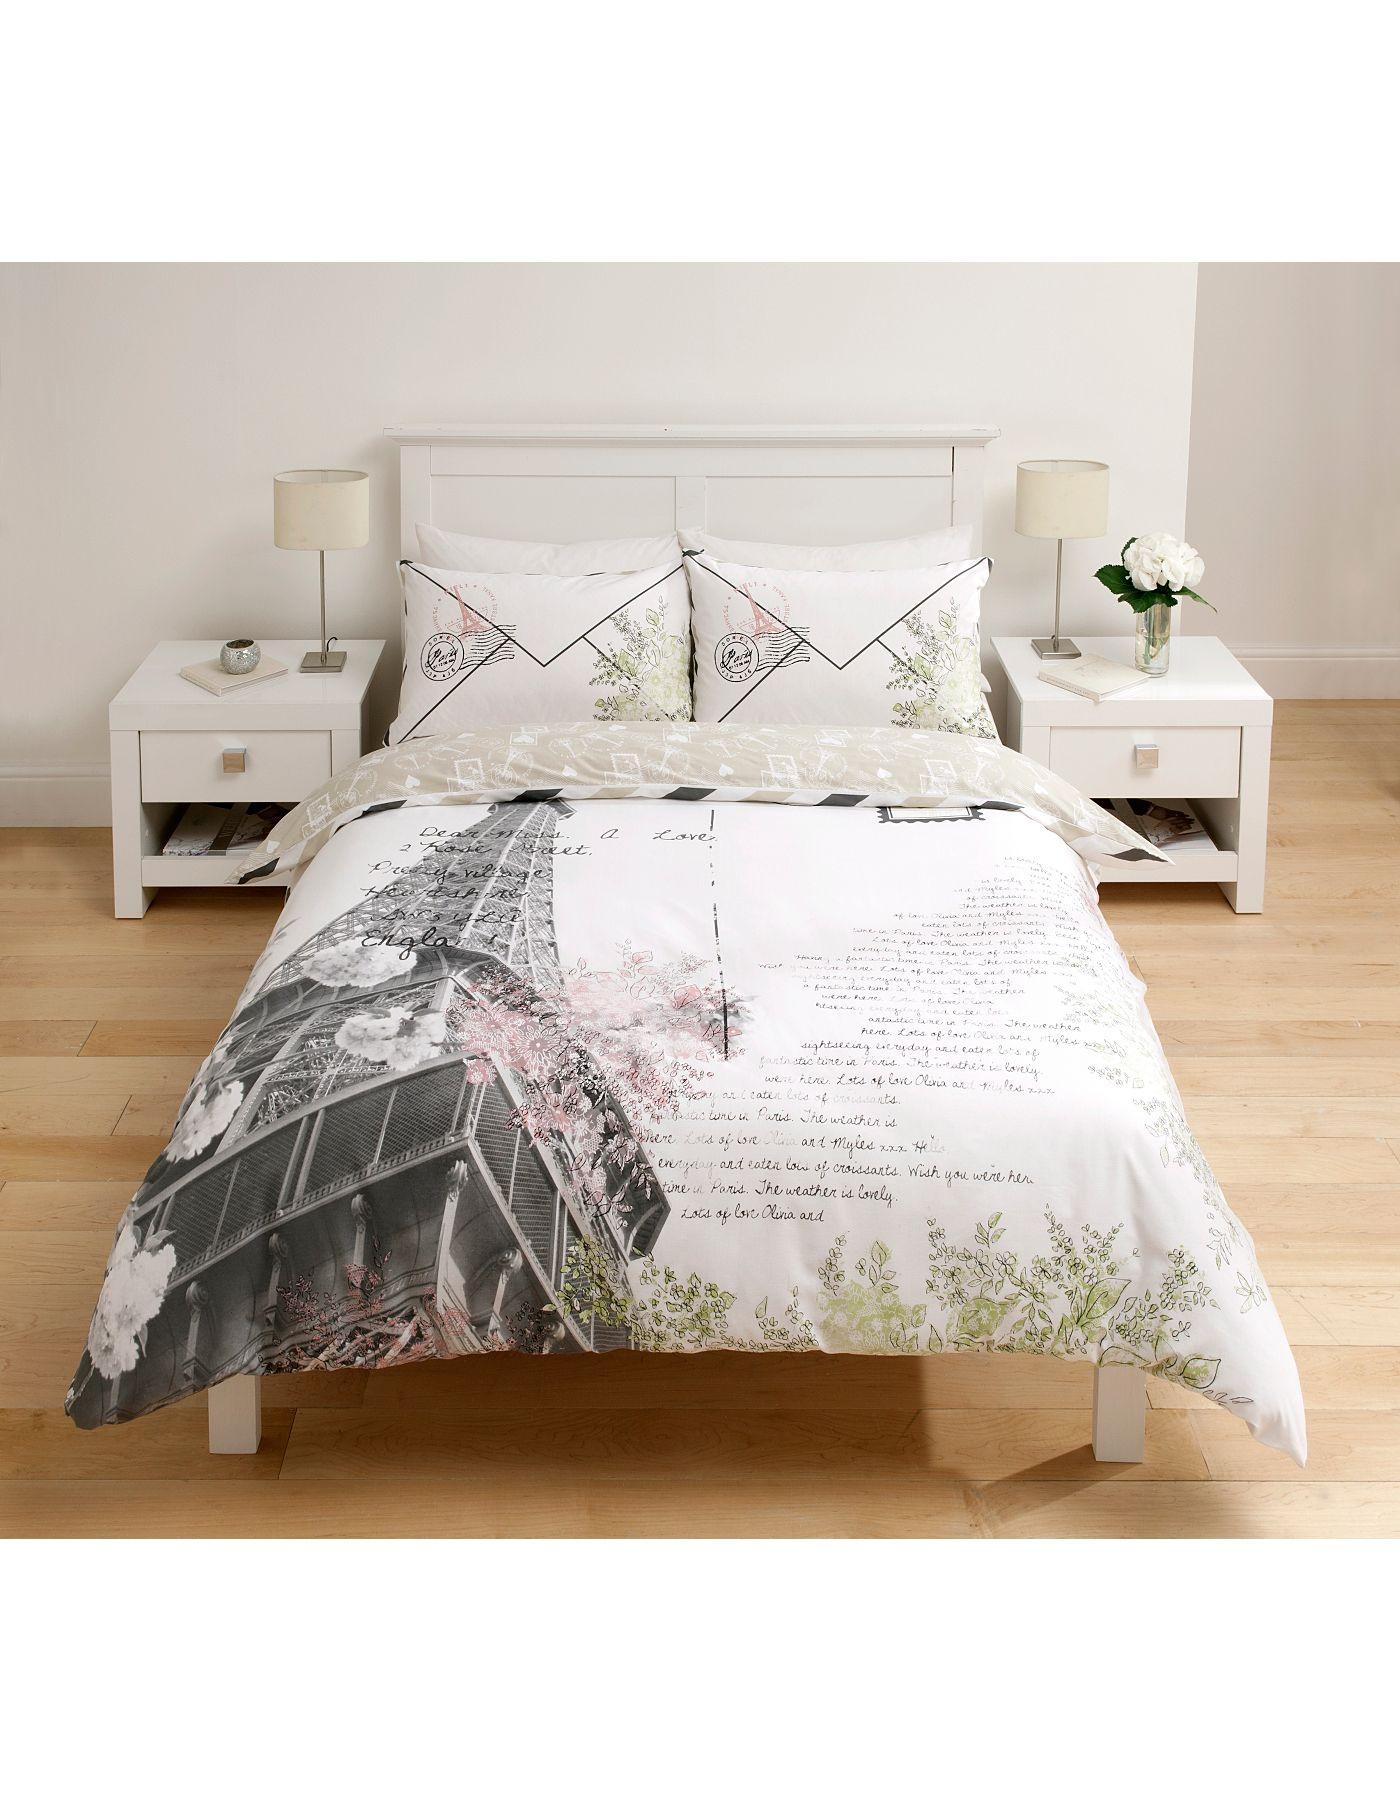 george home parisian postcard duvet set single bedding asda rh pinterest at